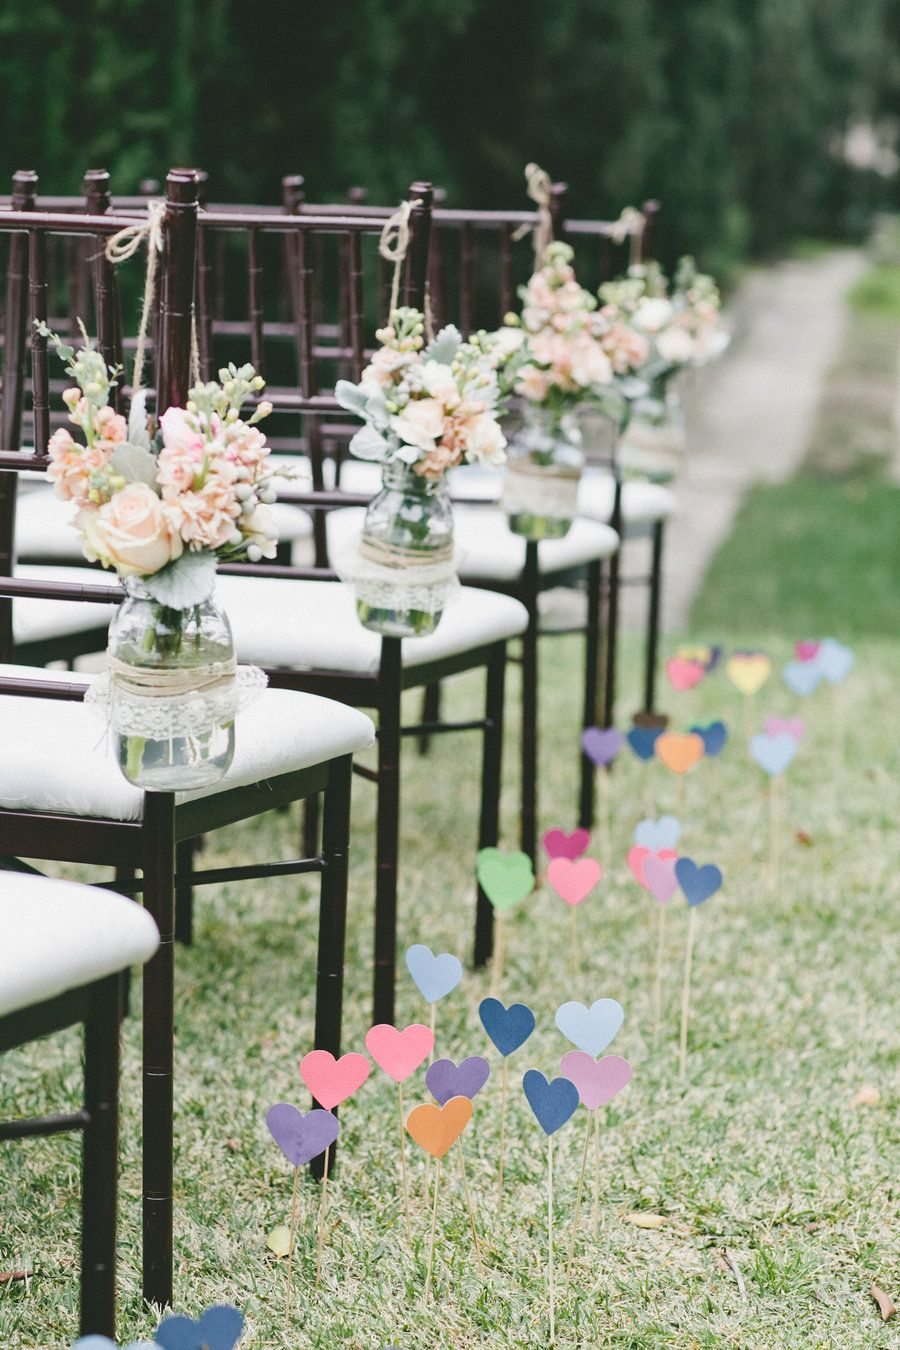 Wedding ceremony chair decorations diy mason jars  When I tie the